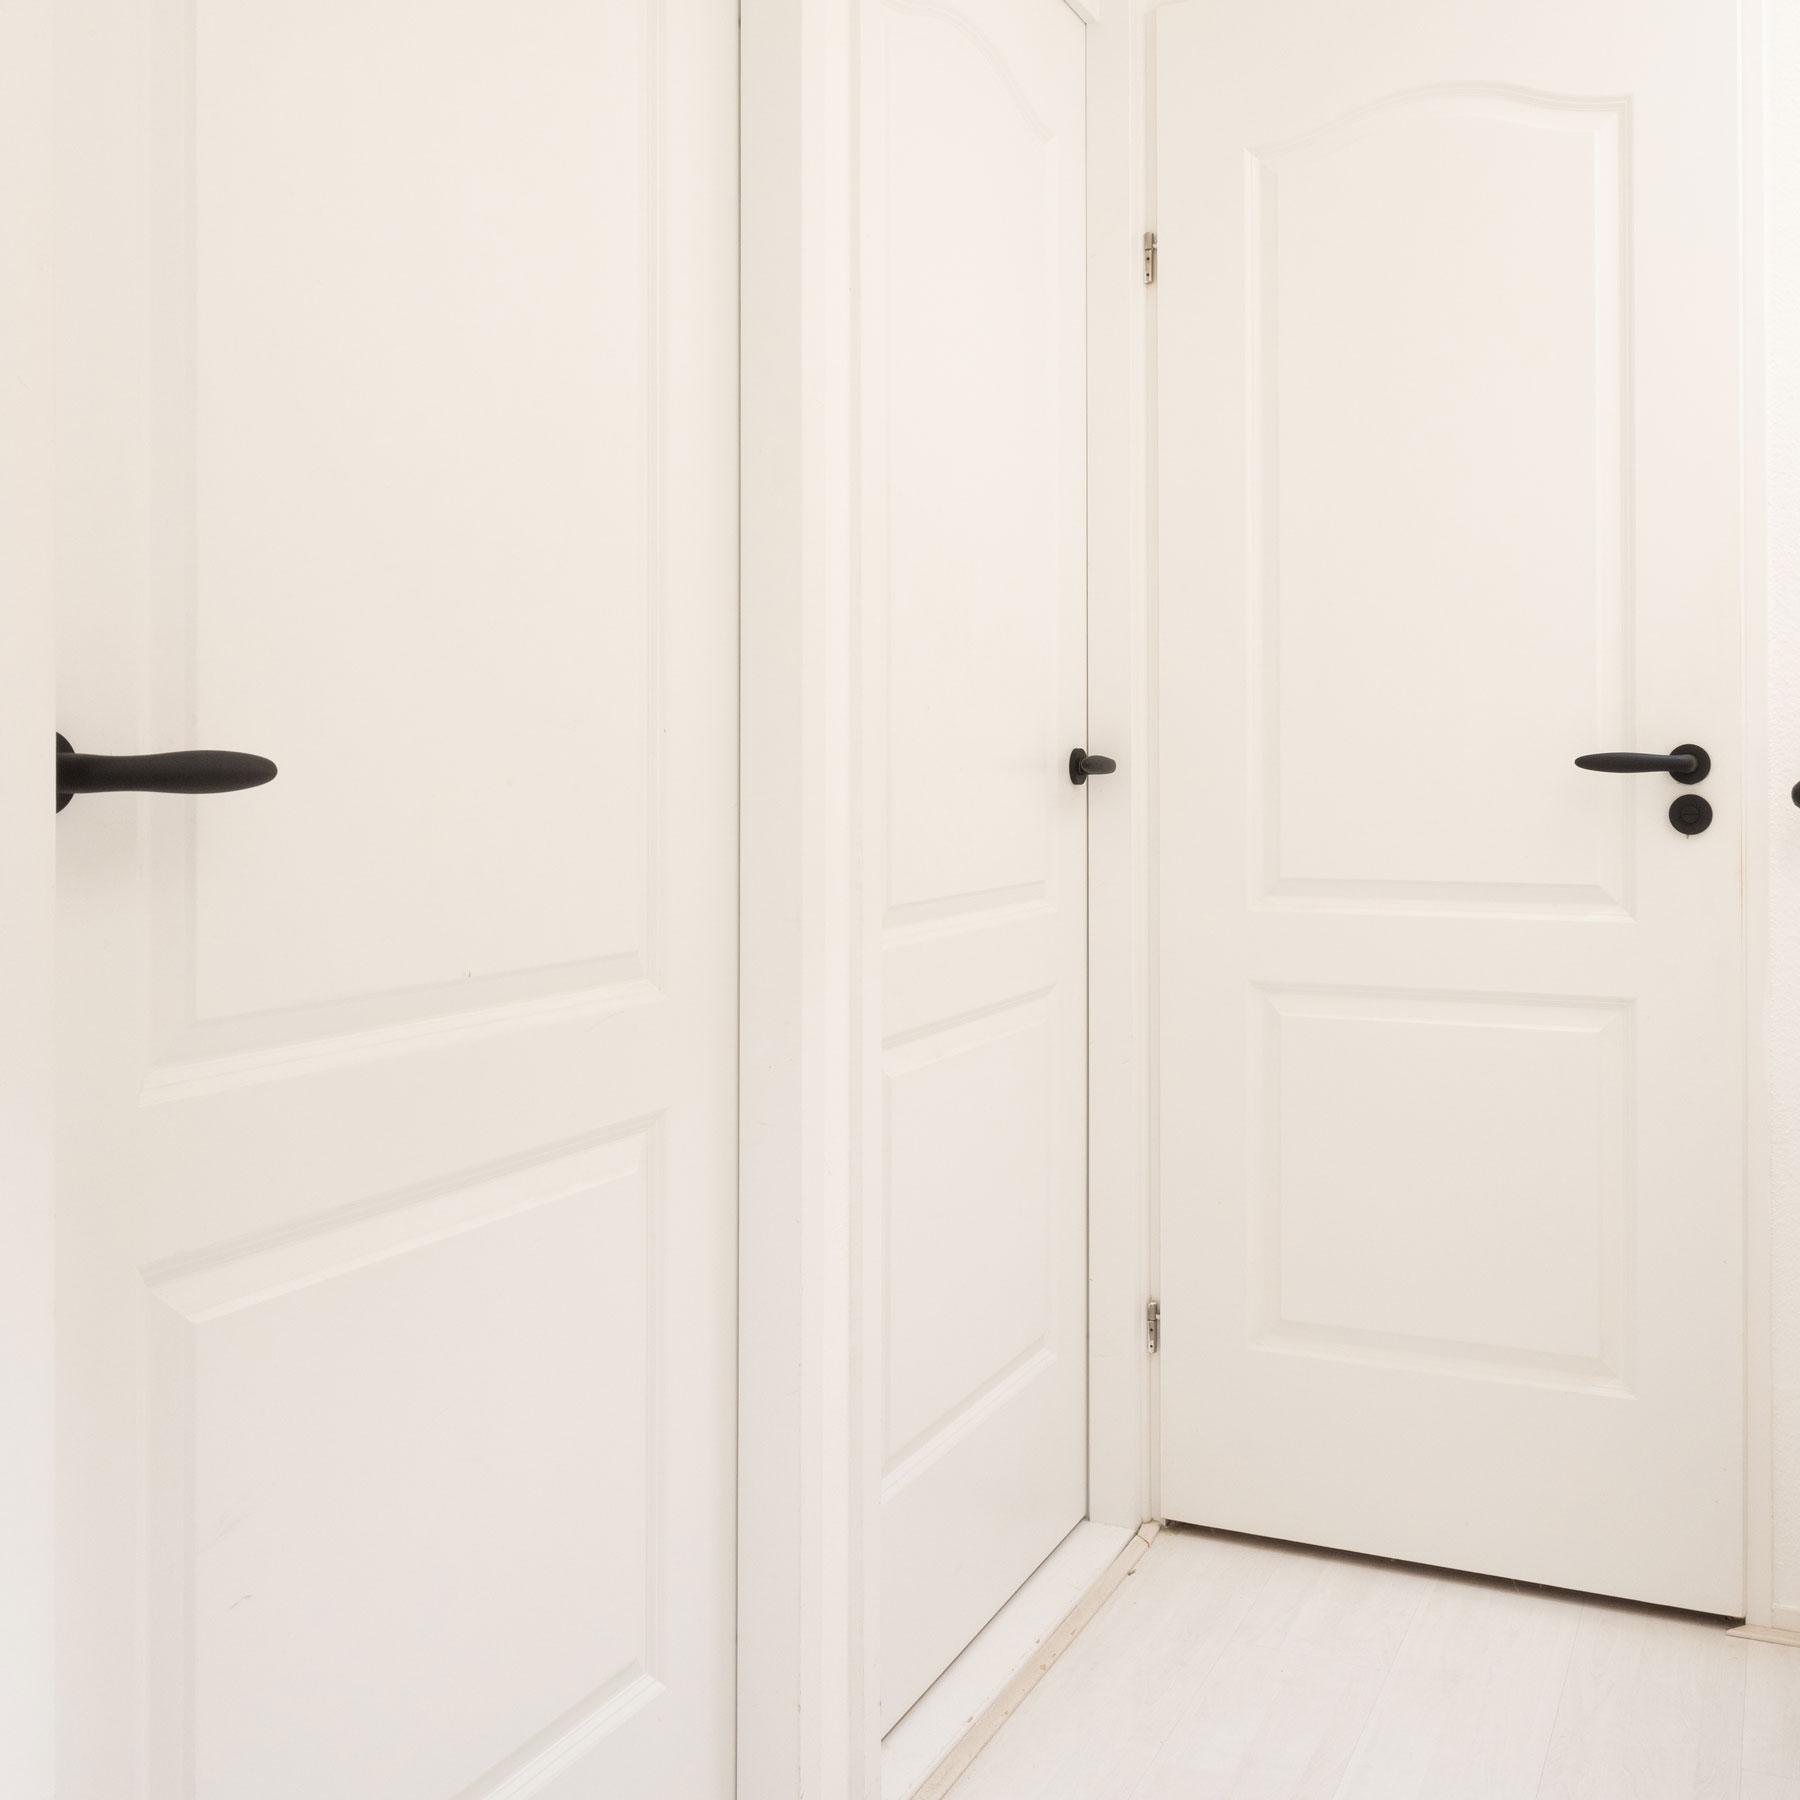 Sfeerimpressie GPF8220 deurkruk op rozet 2.jpg